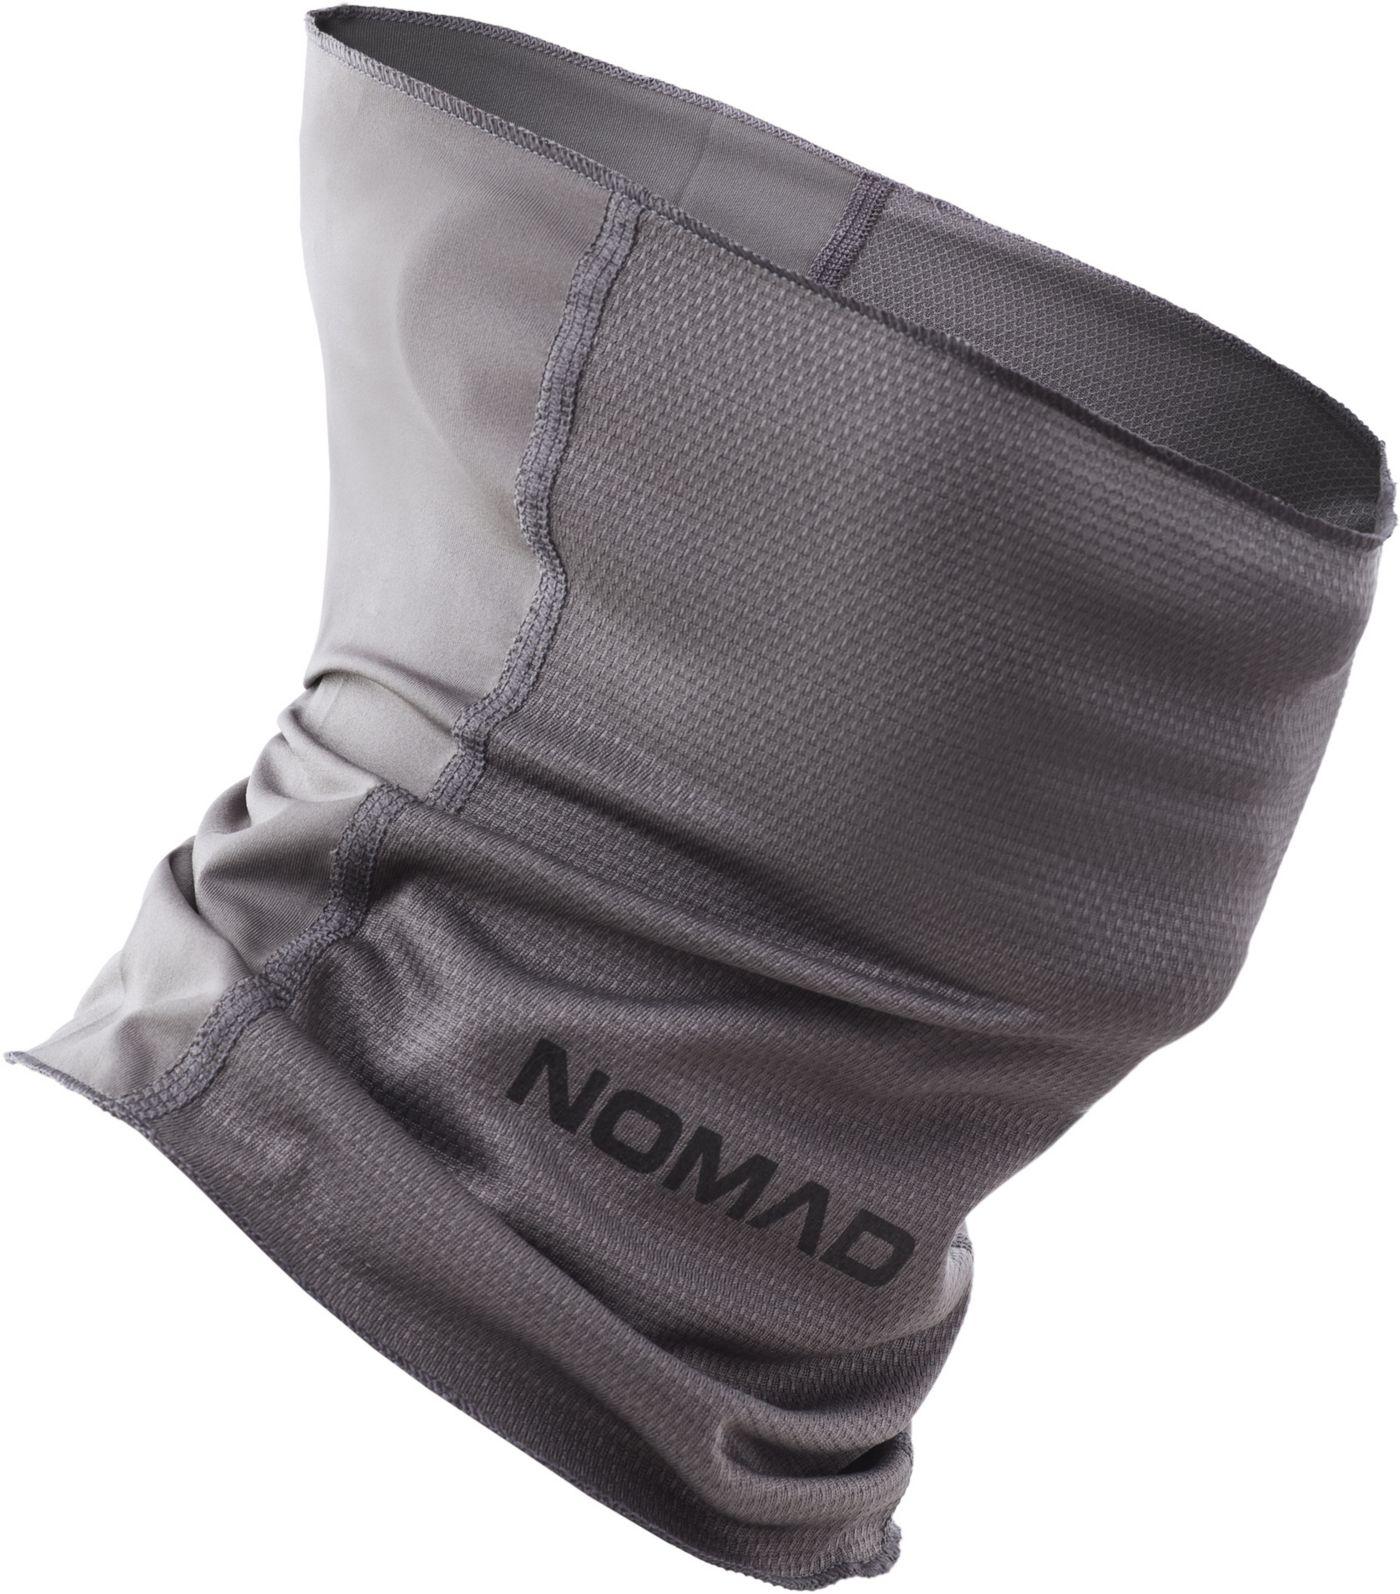 NOMAD Solid Neck Gaiter